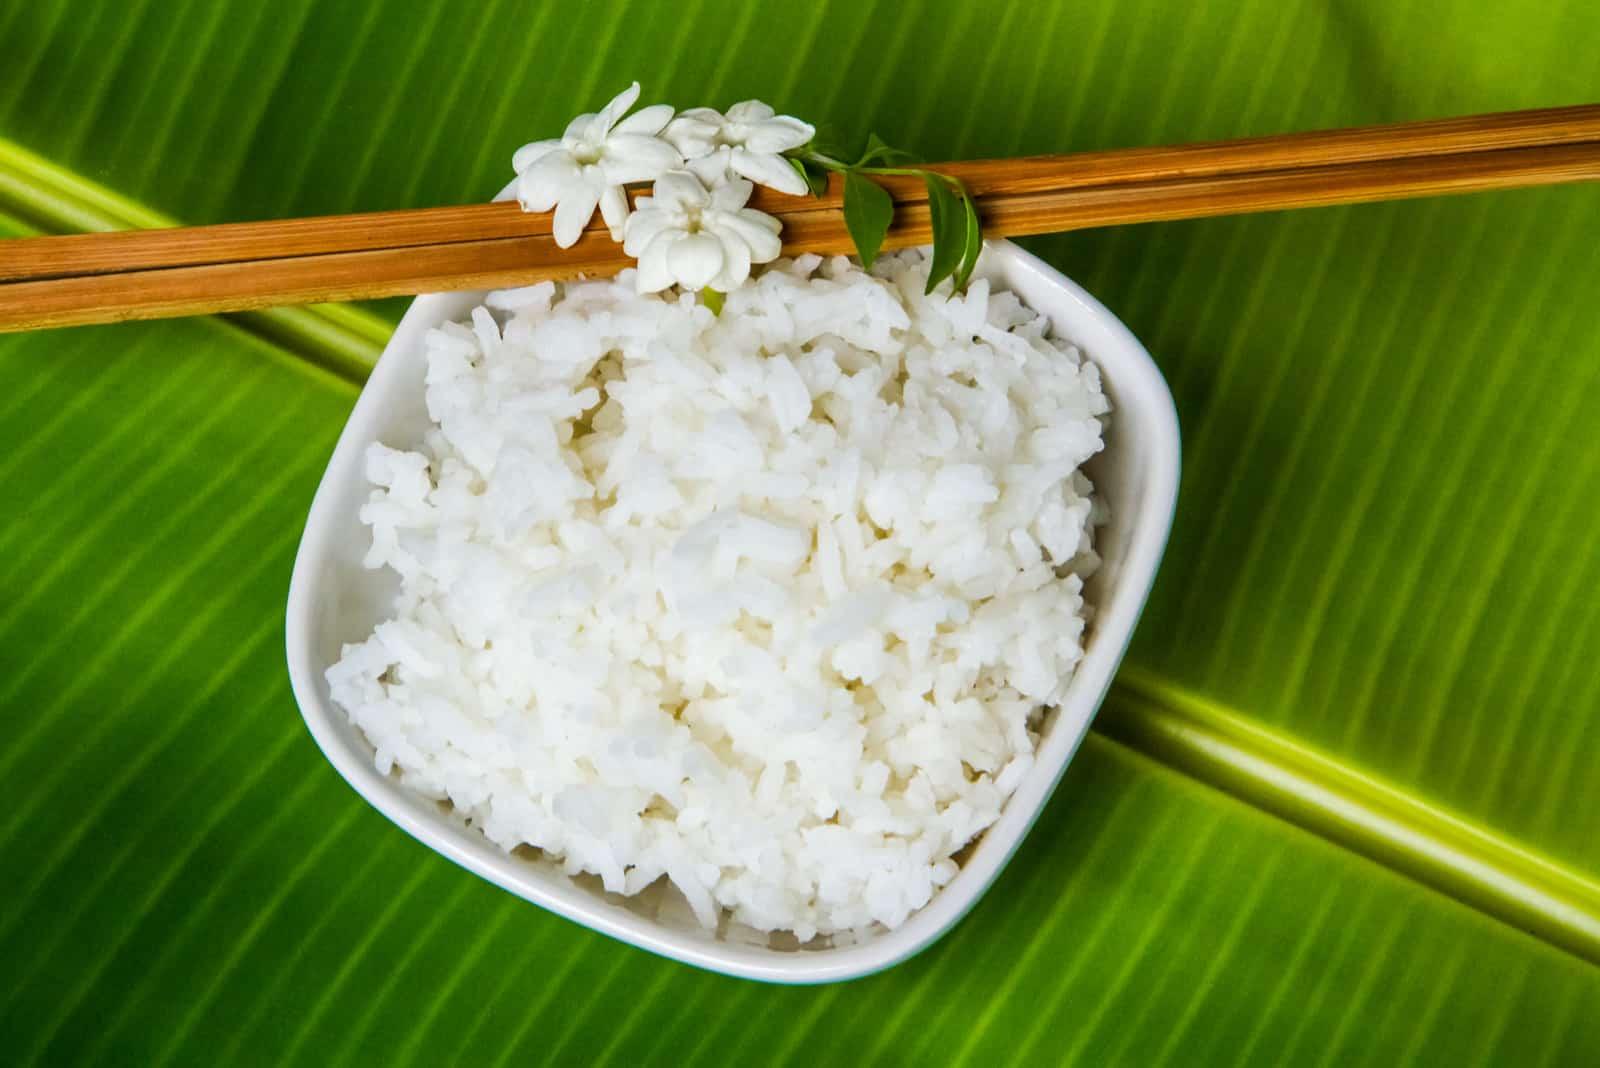 white jasmine rice on green banana leaf